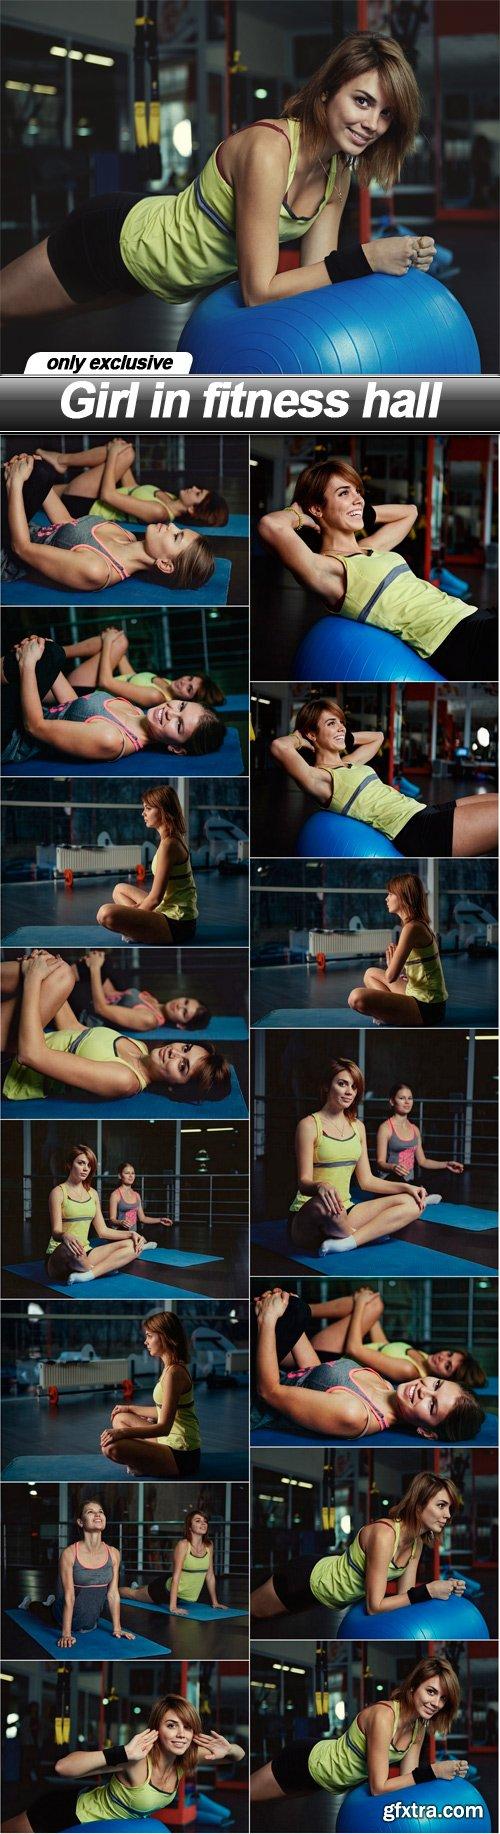 Girl in fitness hall - 15 UHQ JPEG